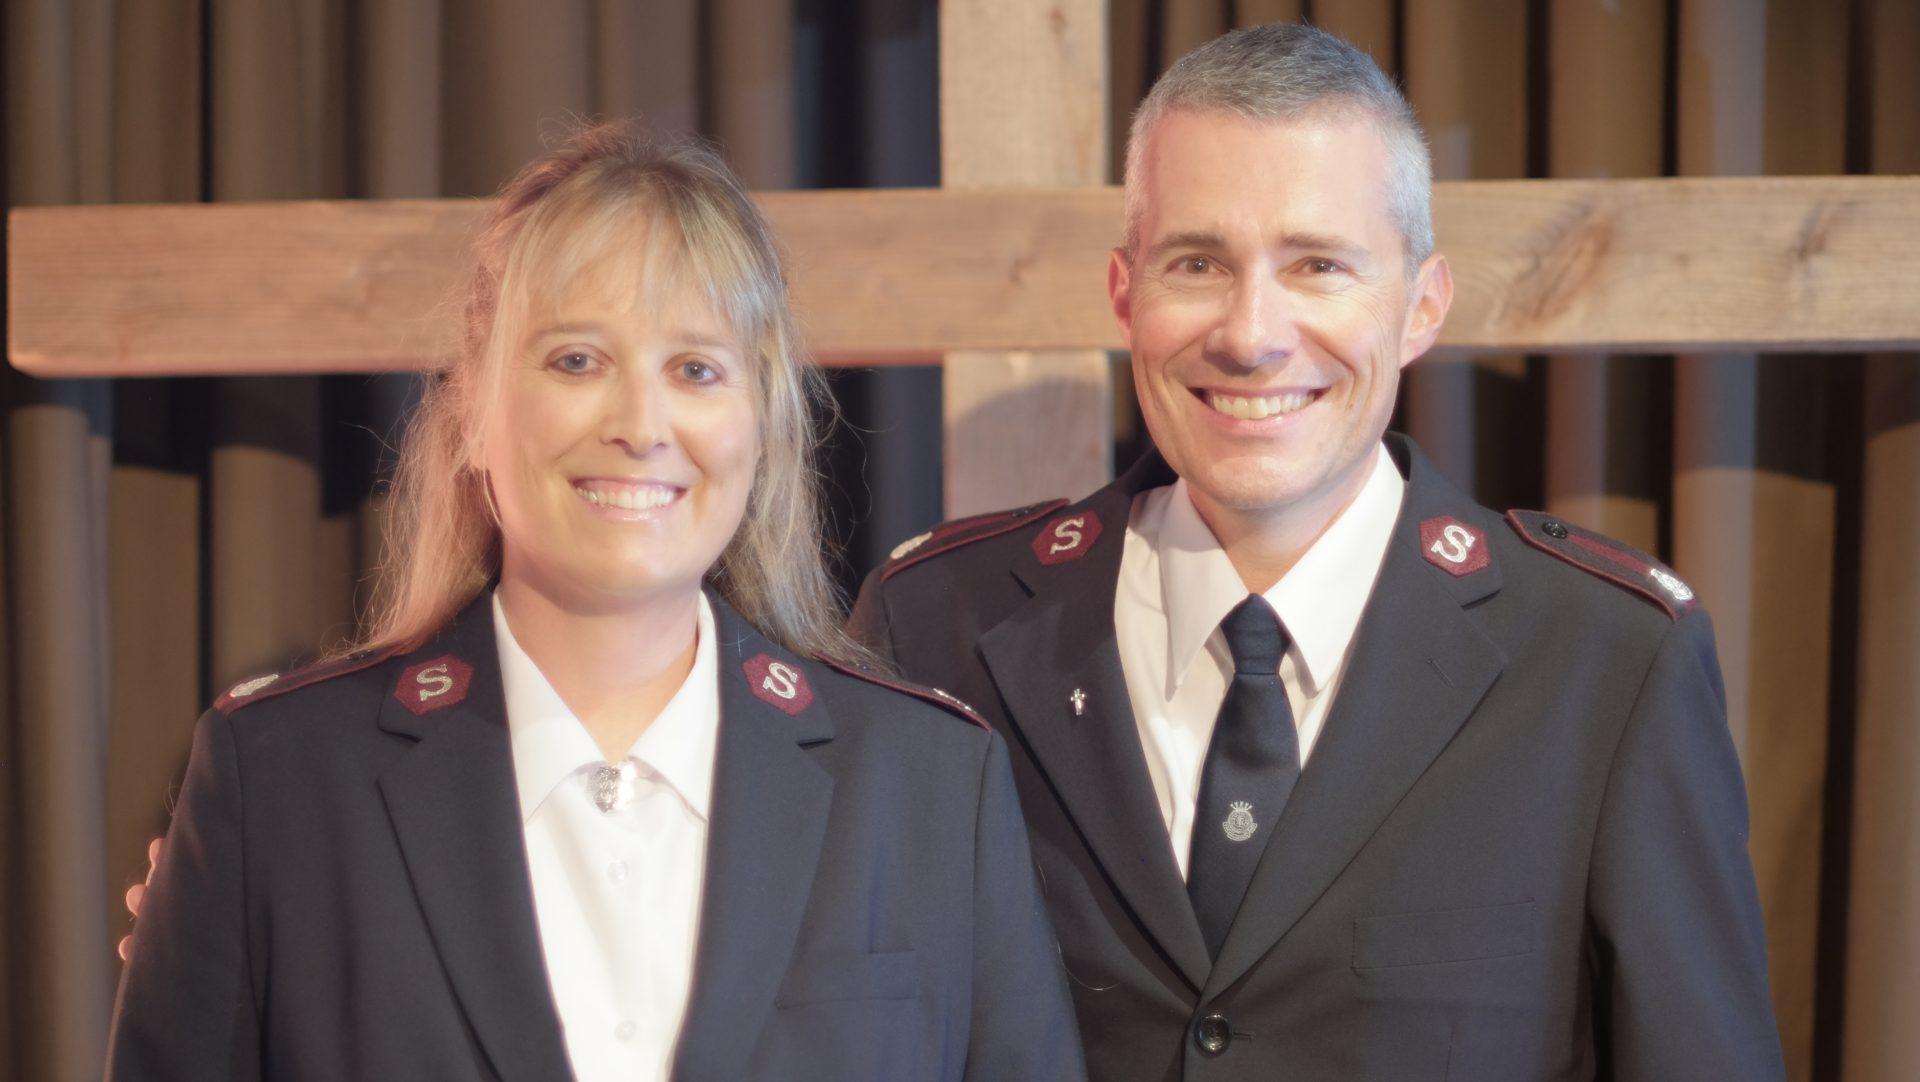 Korpsoffiziere